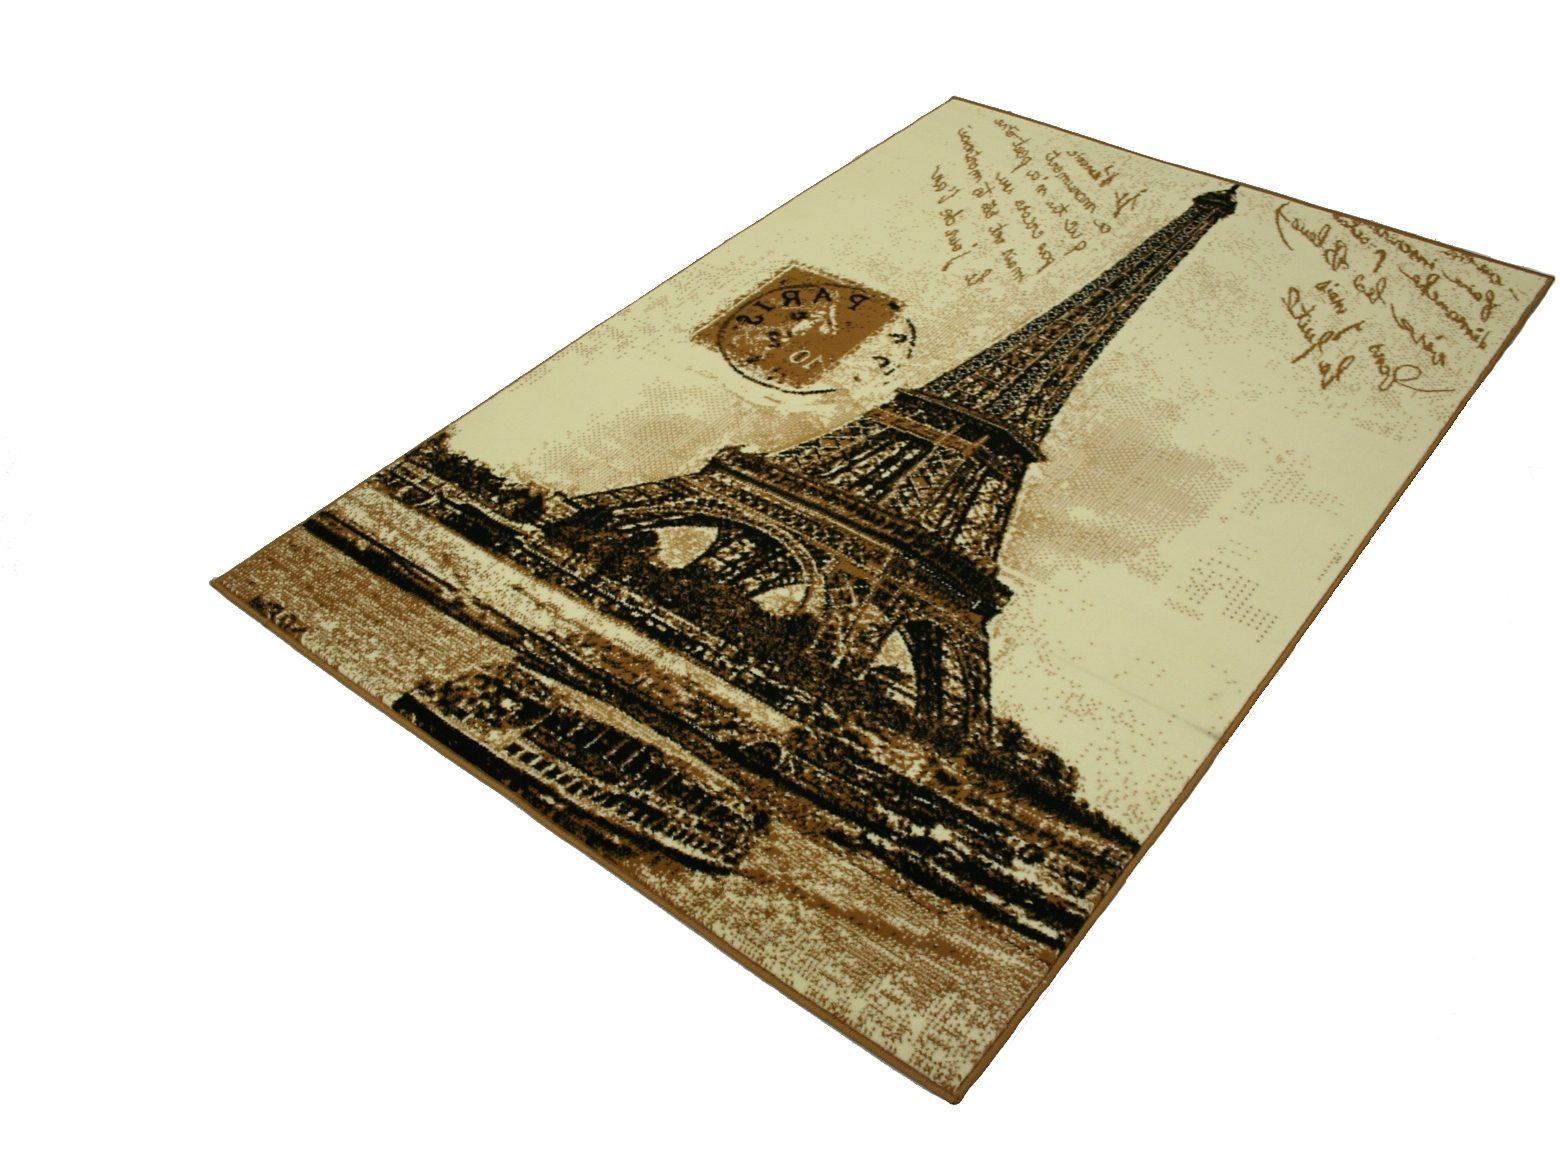 Designteppich »Eifelturm Paris«, Hanse Home, rechteckig, Höhe 9 mm, romantischer Stil